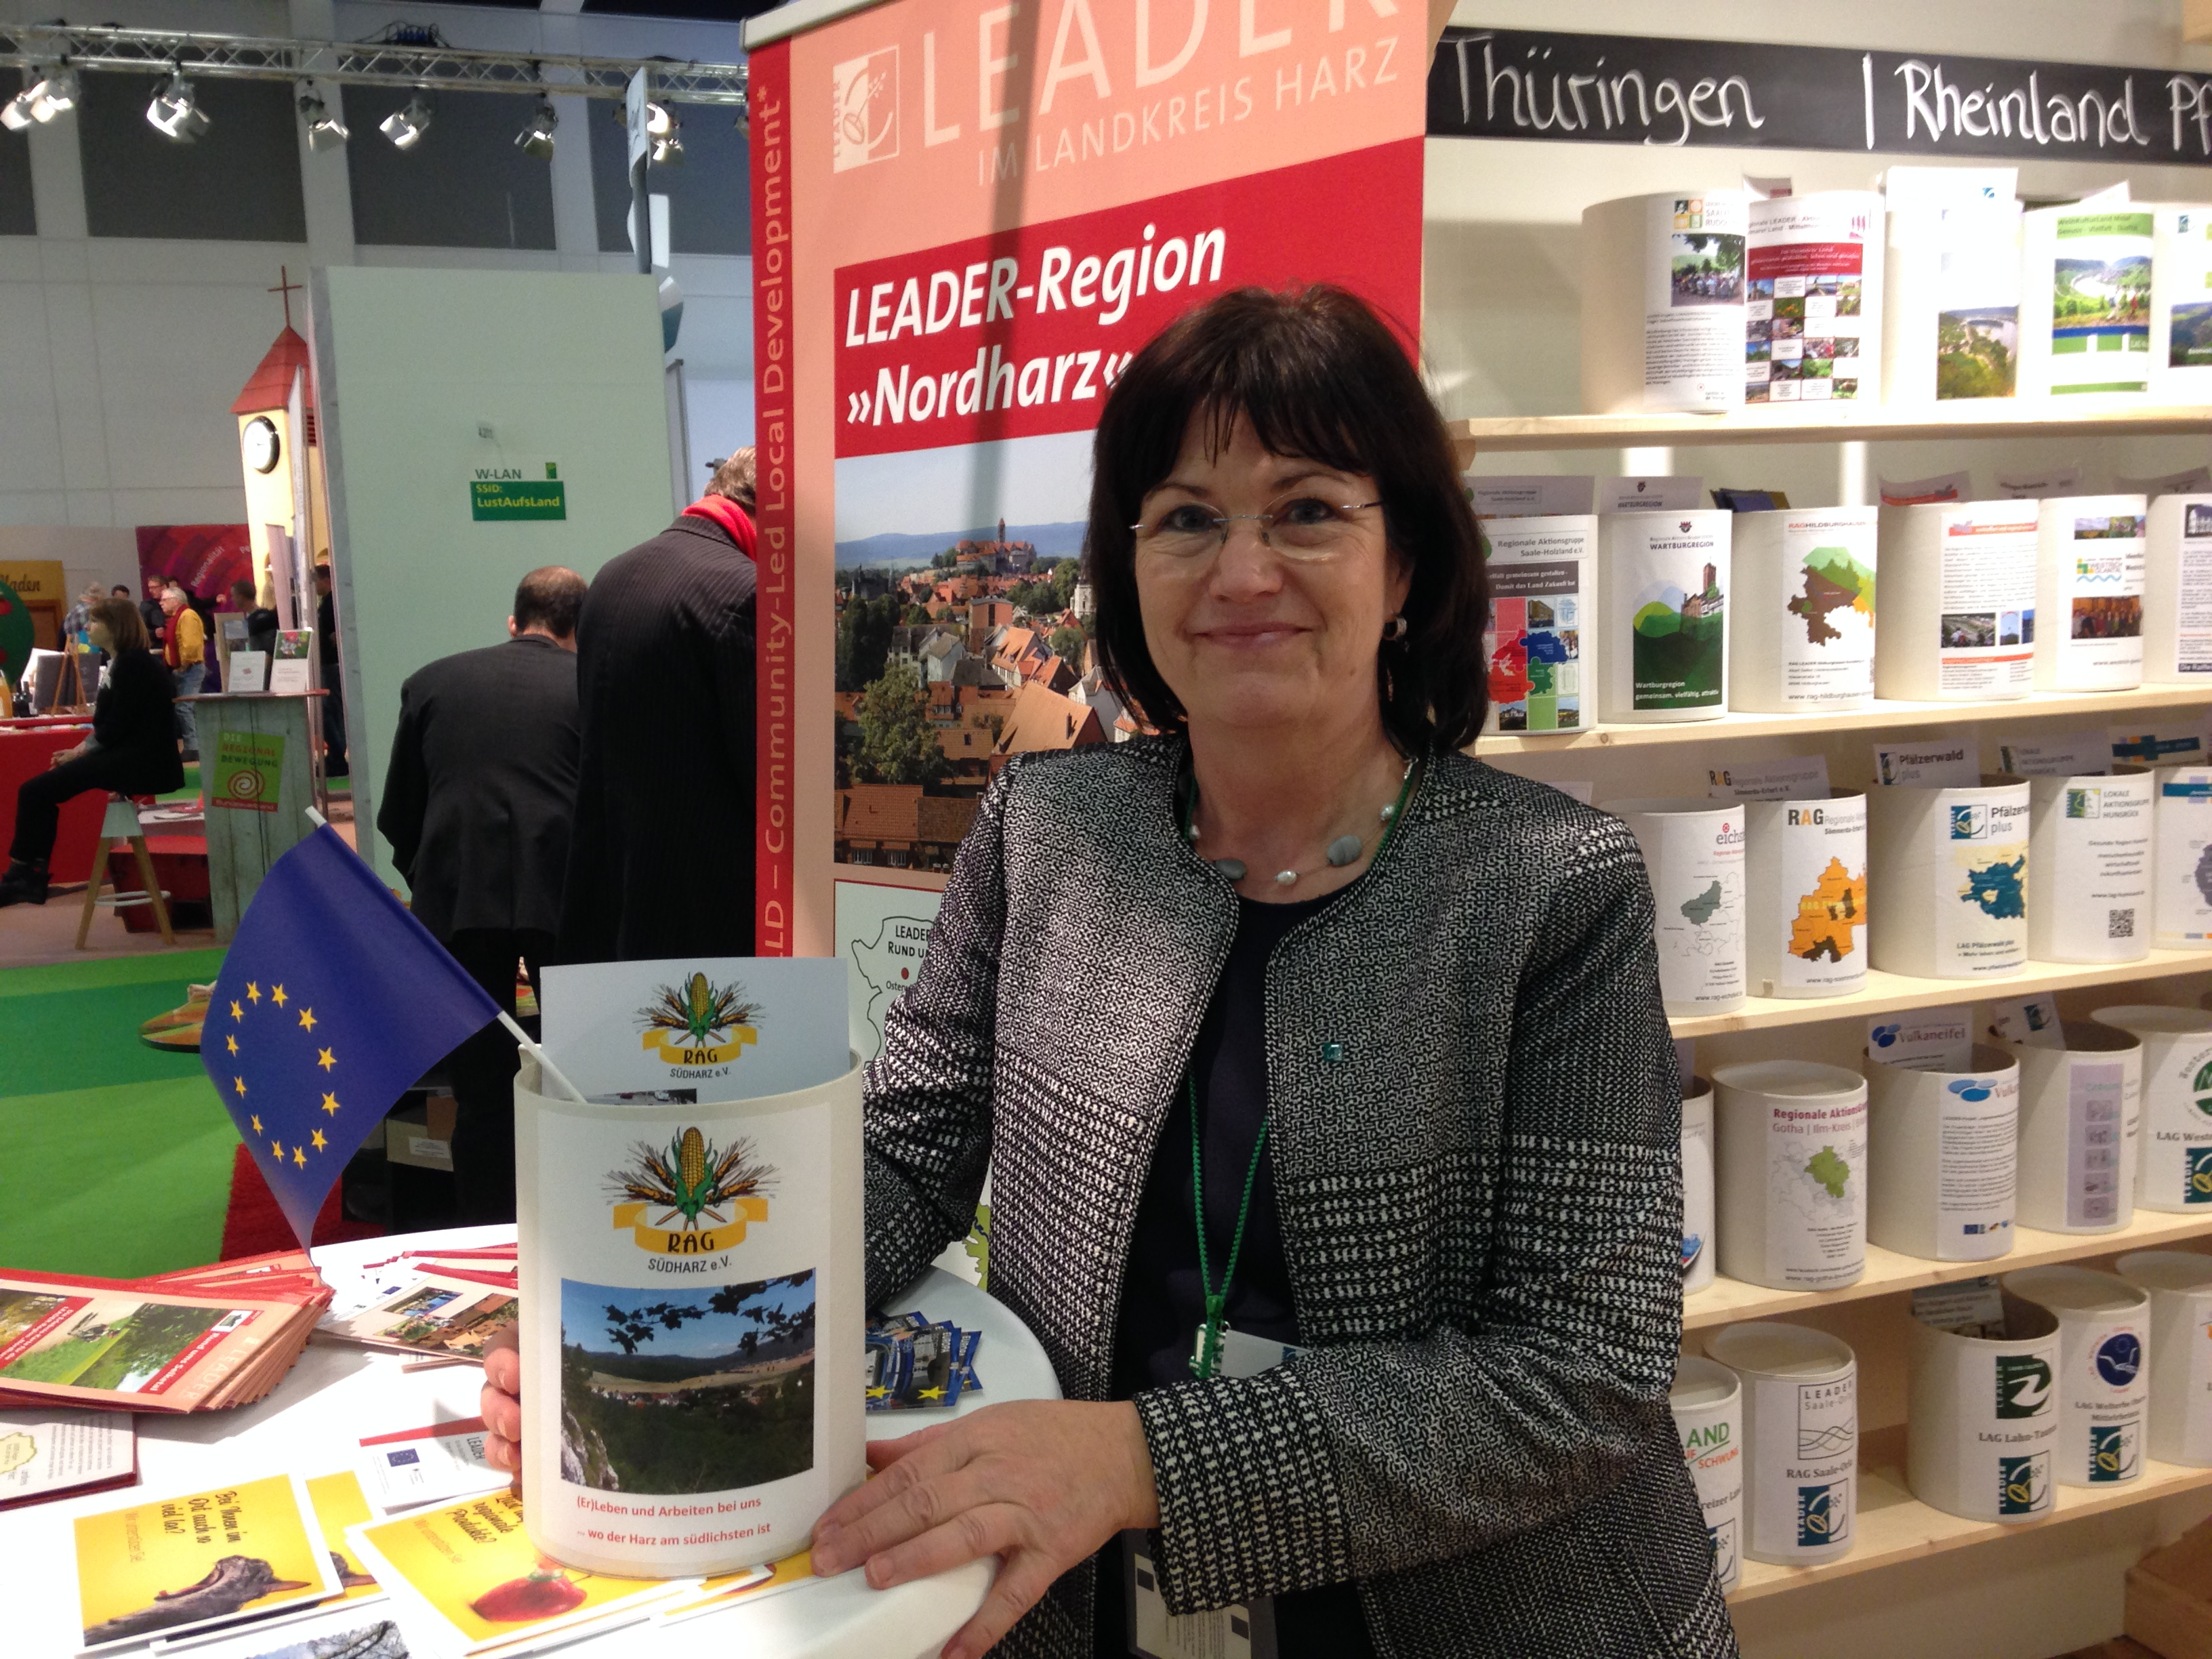 LEADER - Managerin Petra Weigt am Stand der BAG LAG